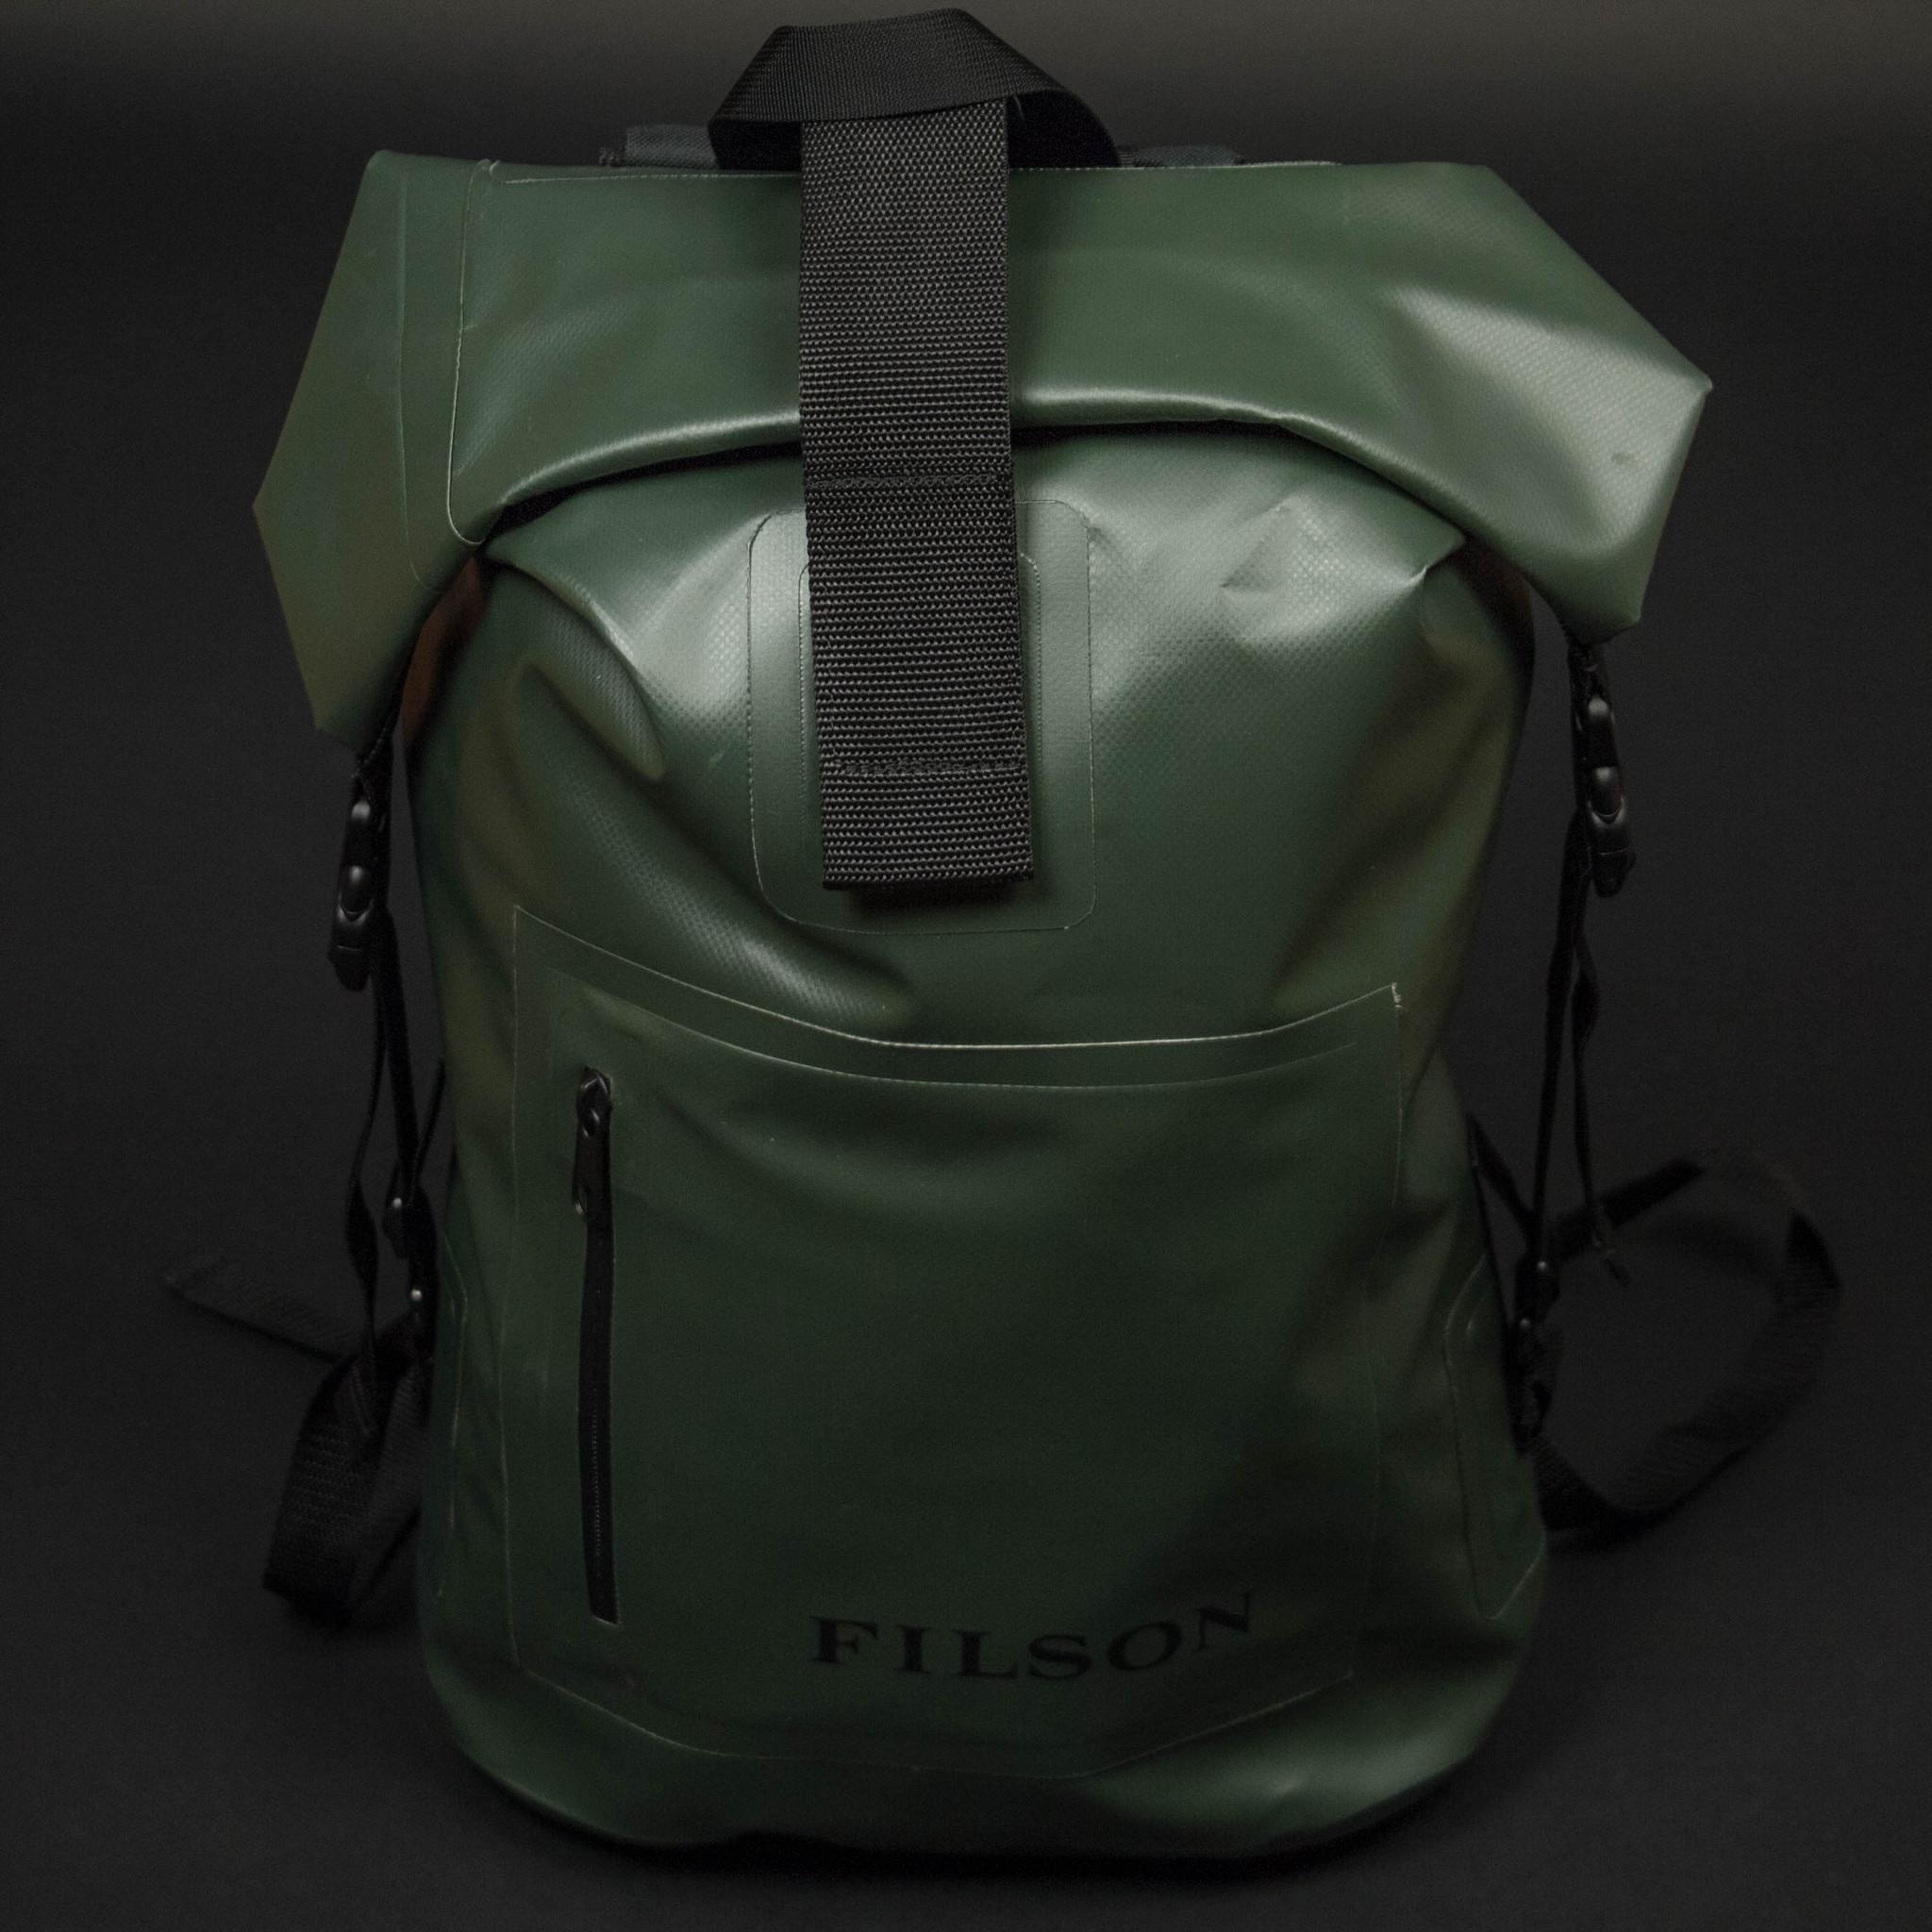 Filson Dry Day Backpack – gym bag for men